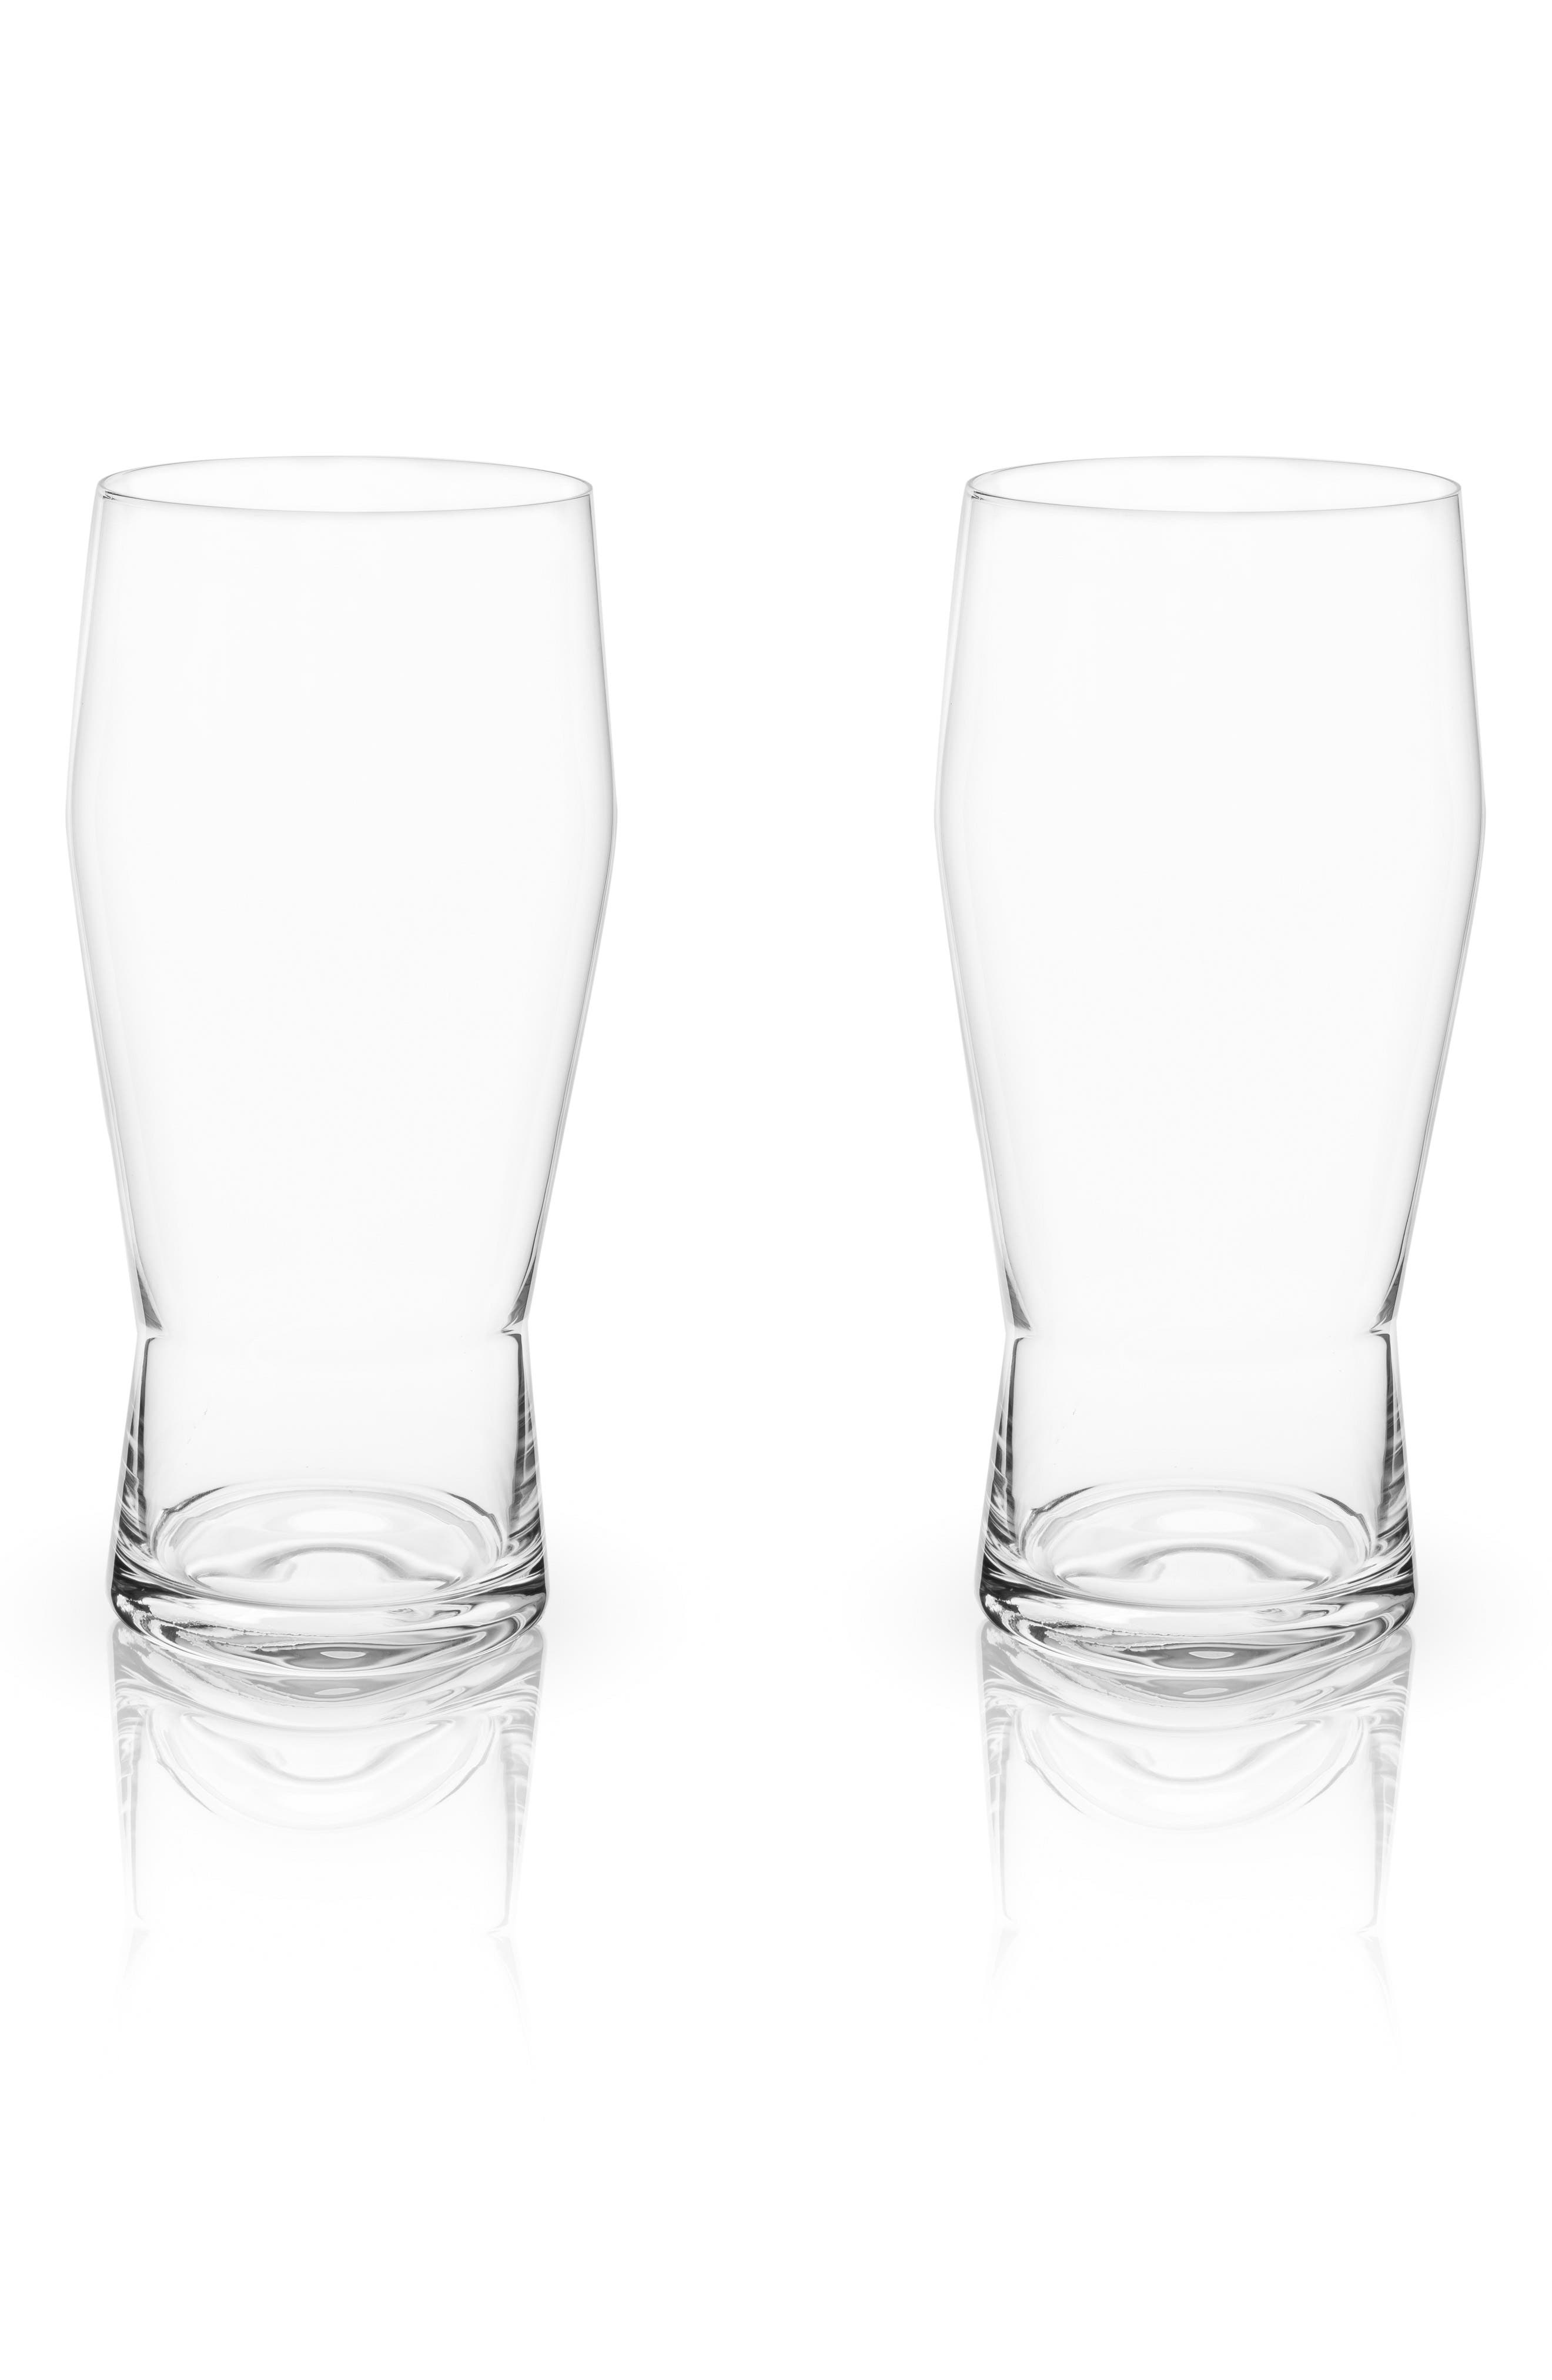 Set of 2 Pub Glasses,                         Main,                         color, White